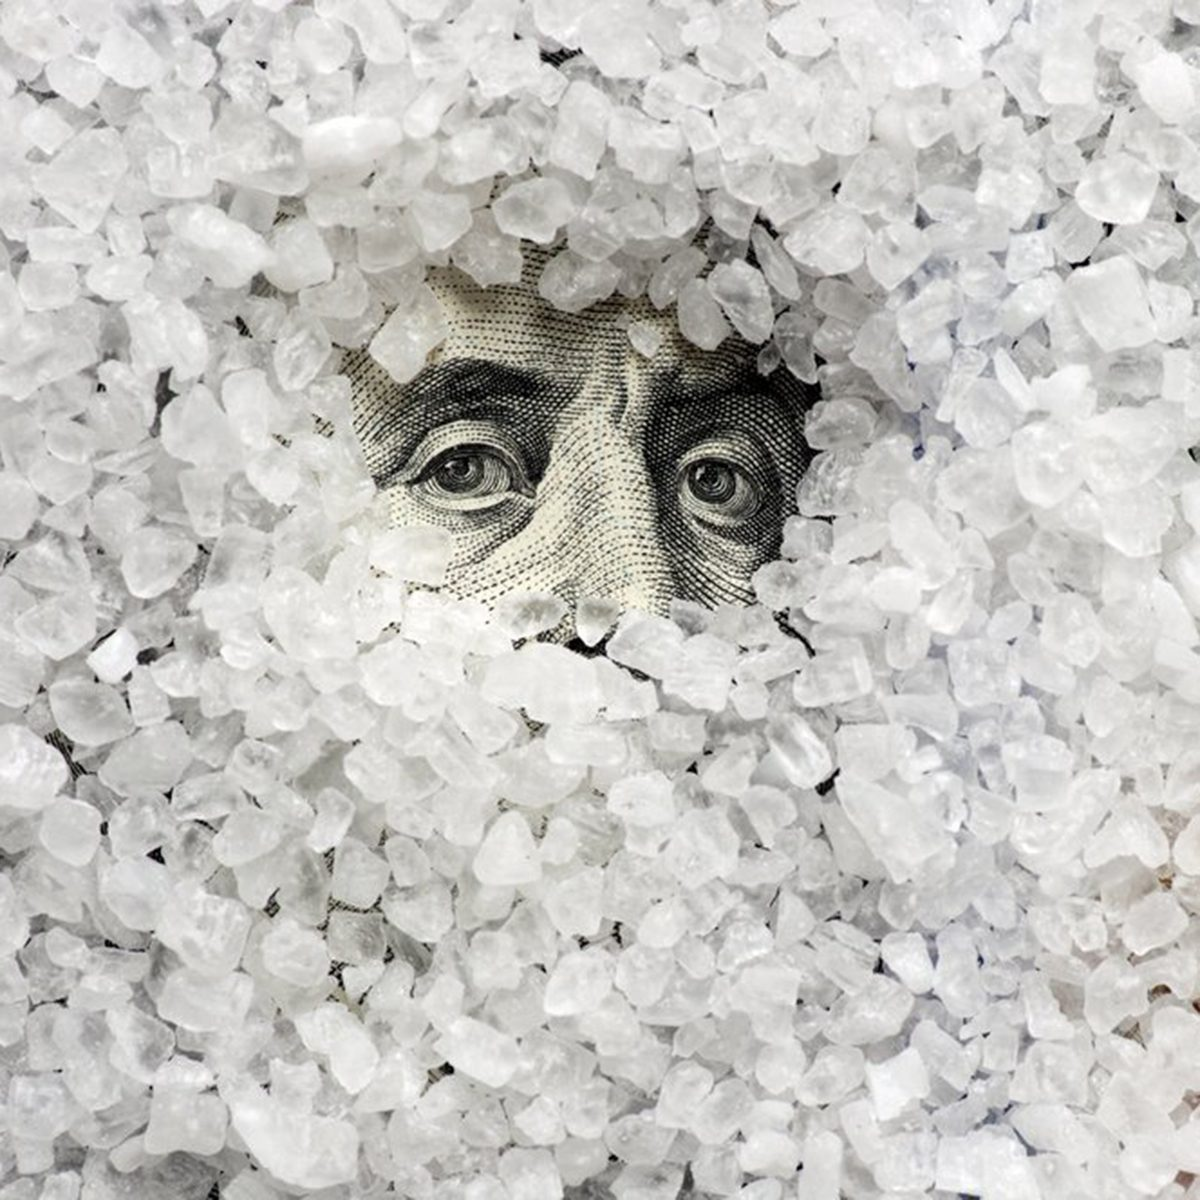 Salt covering 100 bill